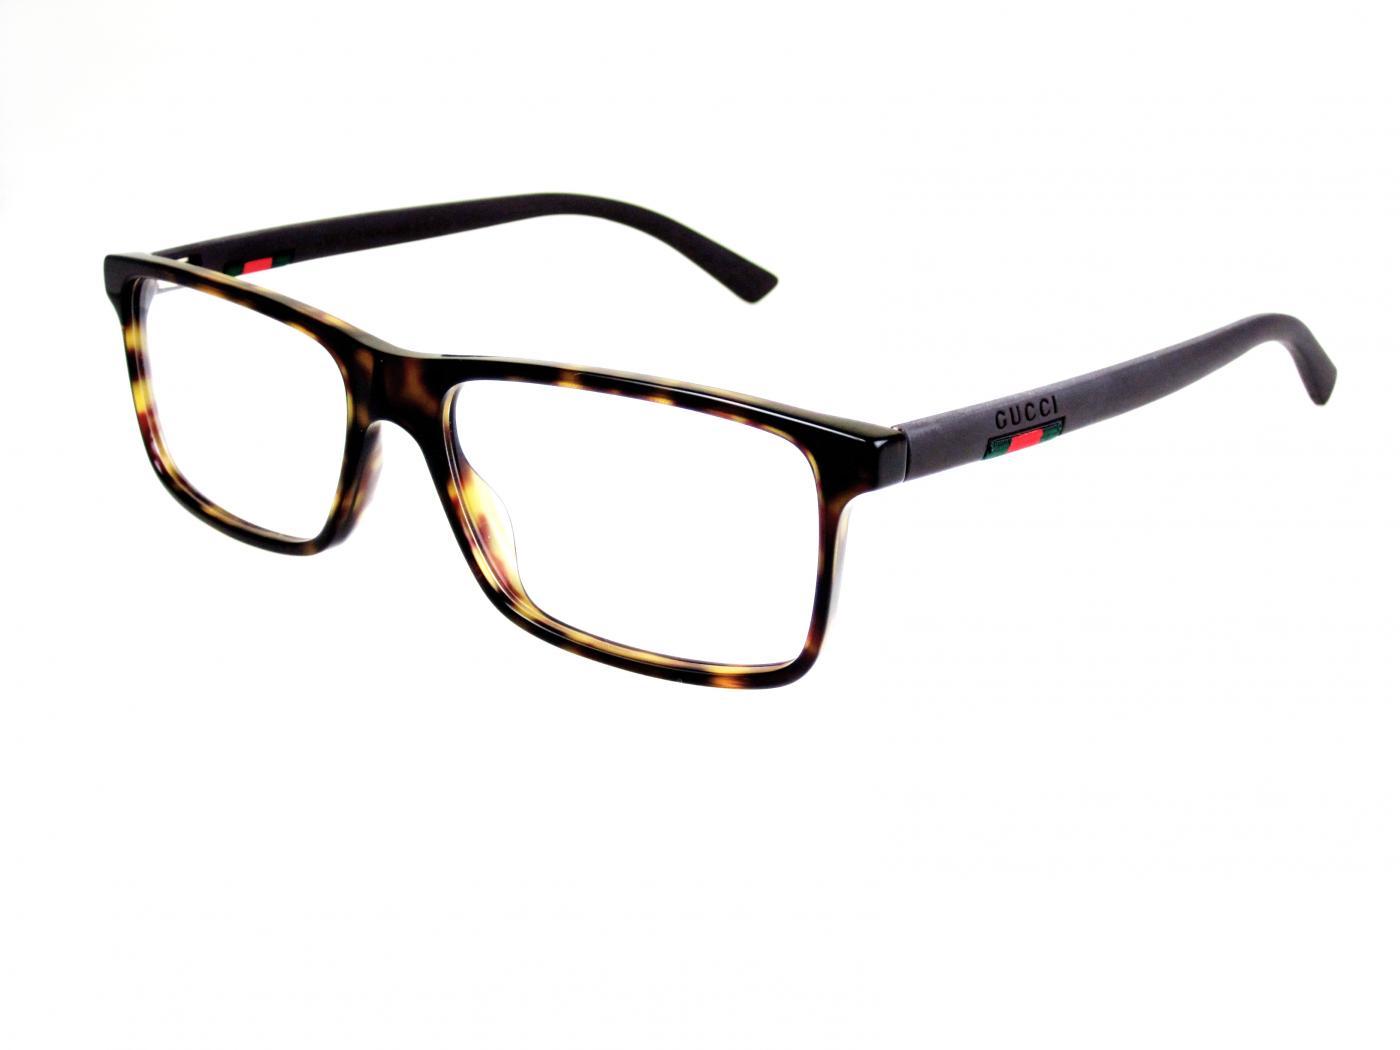 Pánske dioptrické okuliare Gucci 62c92aefd55